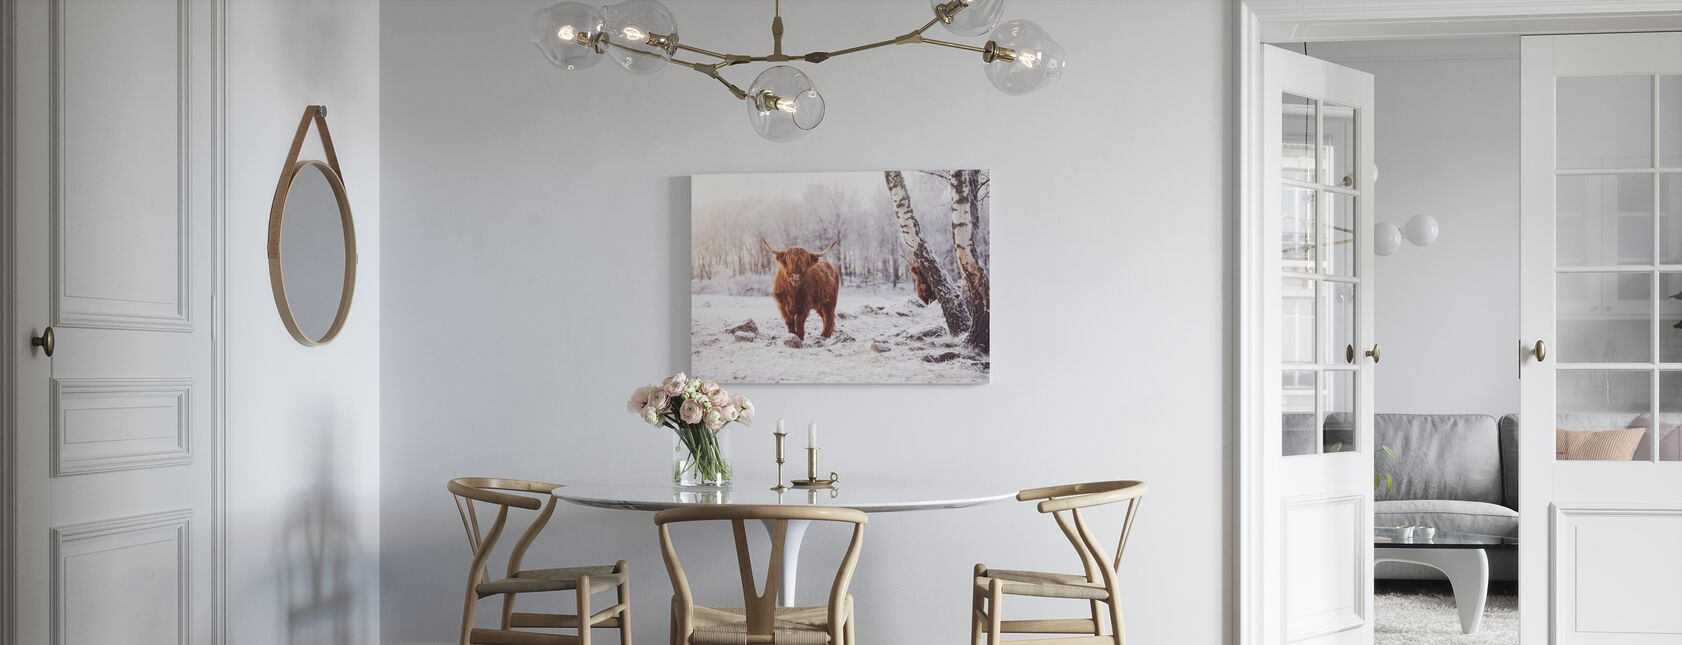 Highland Runderen - Canvas print - Keuken